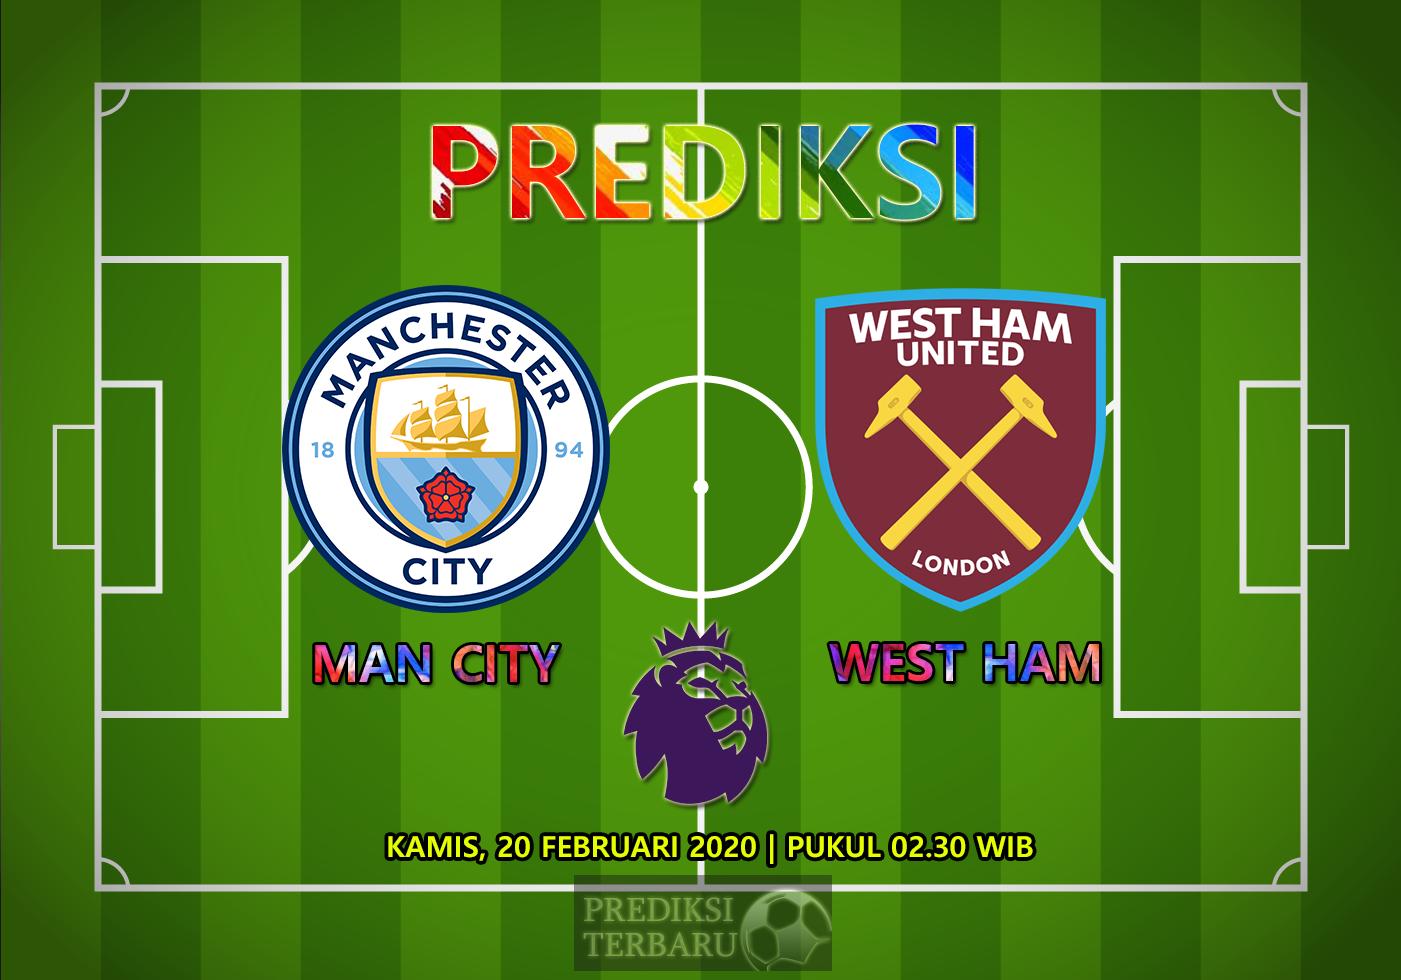 Prediksi Manchester City Vs West Ham, Kamis 20 Februari